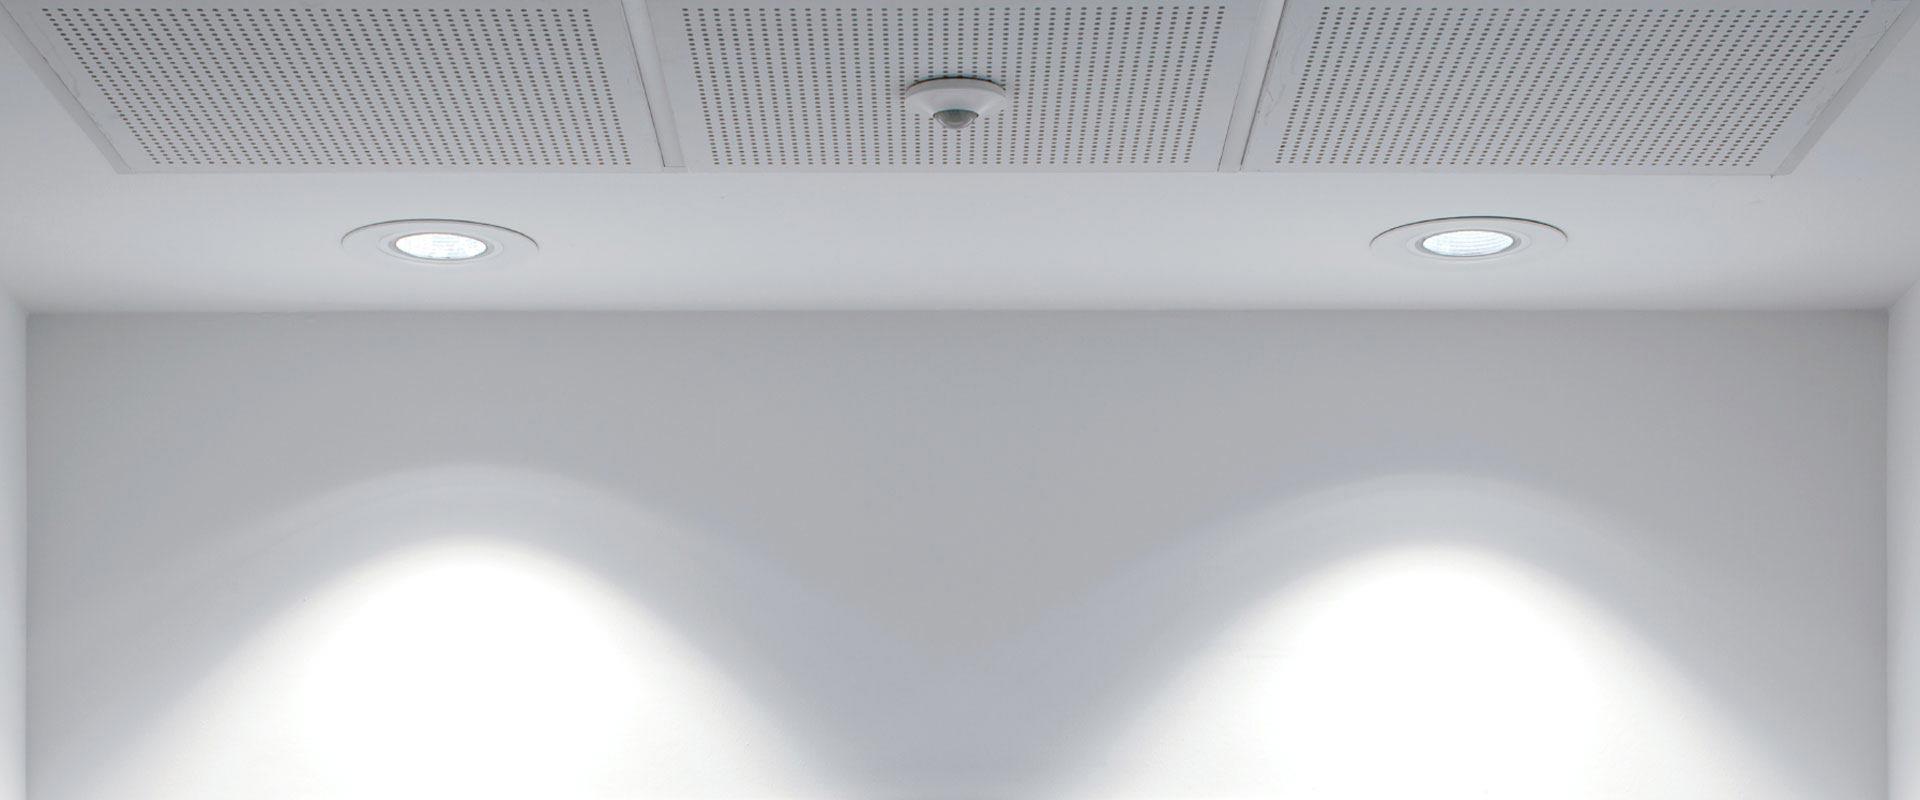 & Inperla Ligra Plus LED | TRILUX